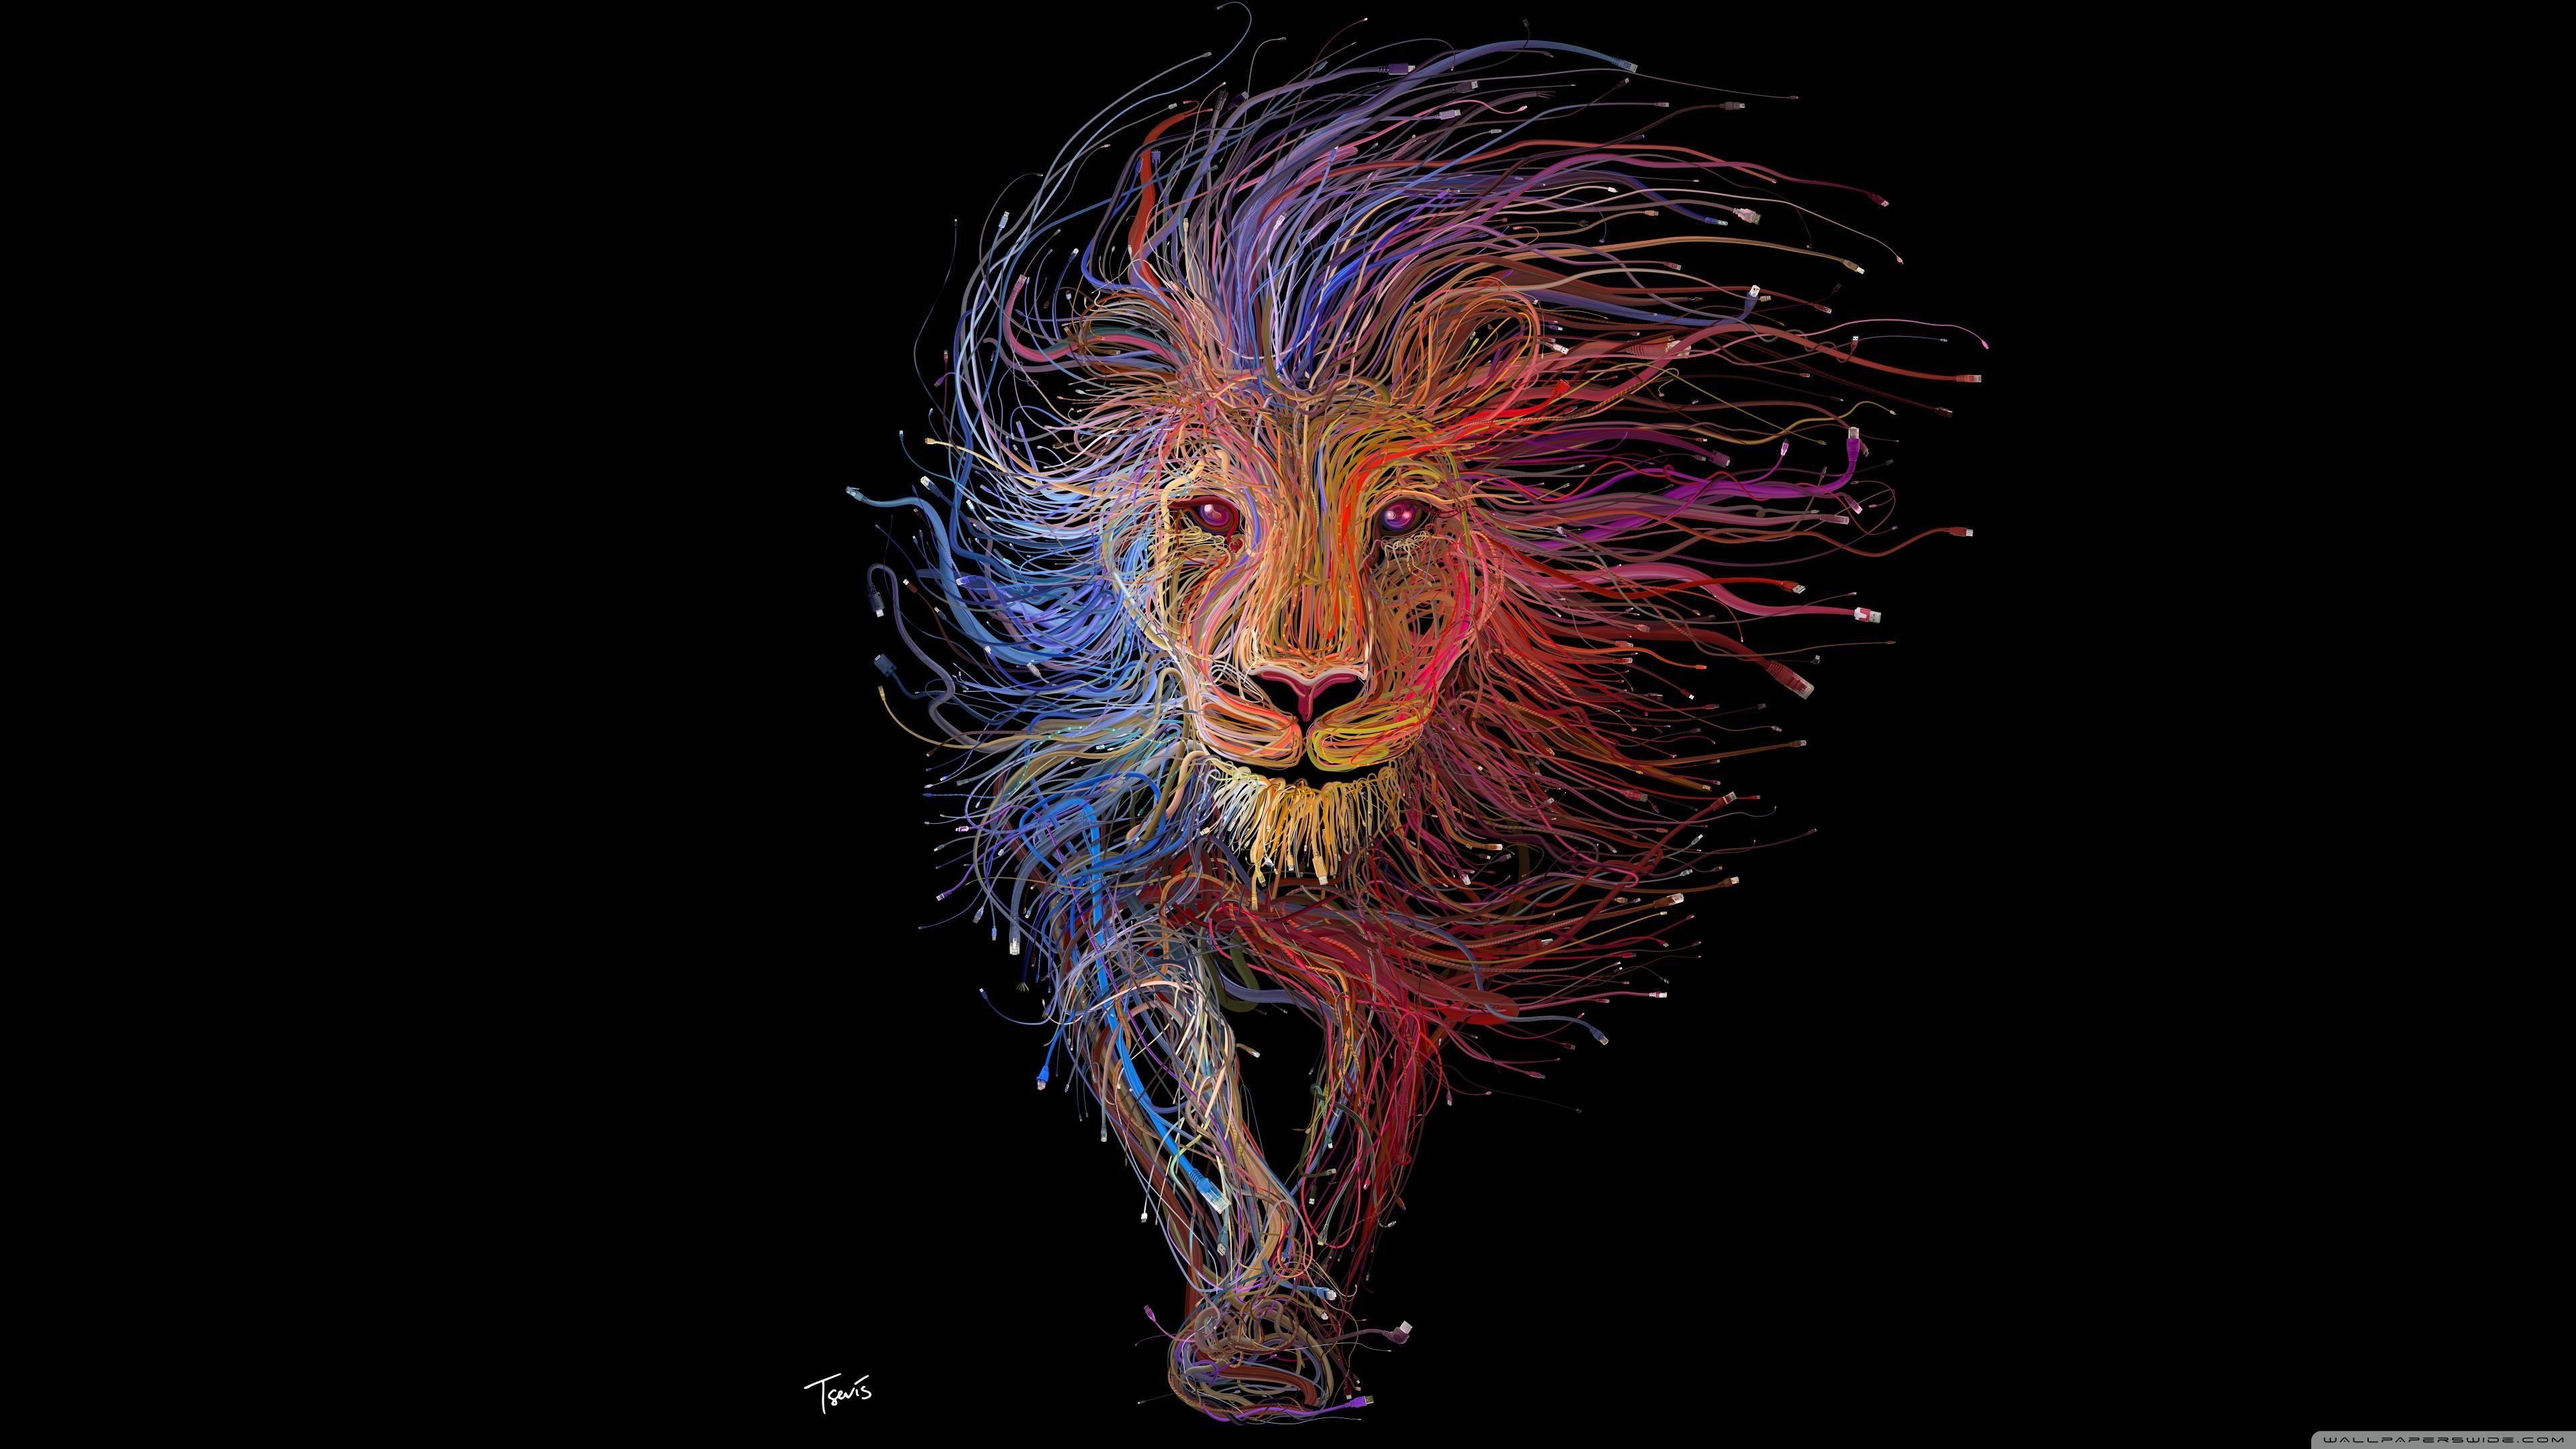 Ultra Hd 32k Wallpapers 1662220 In 2019 Lion Illustration